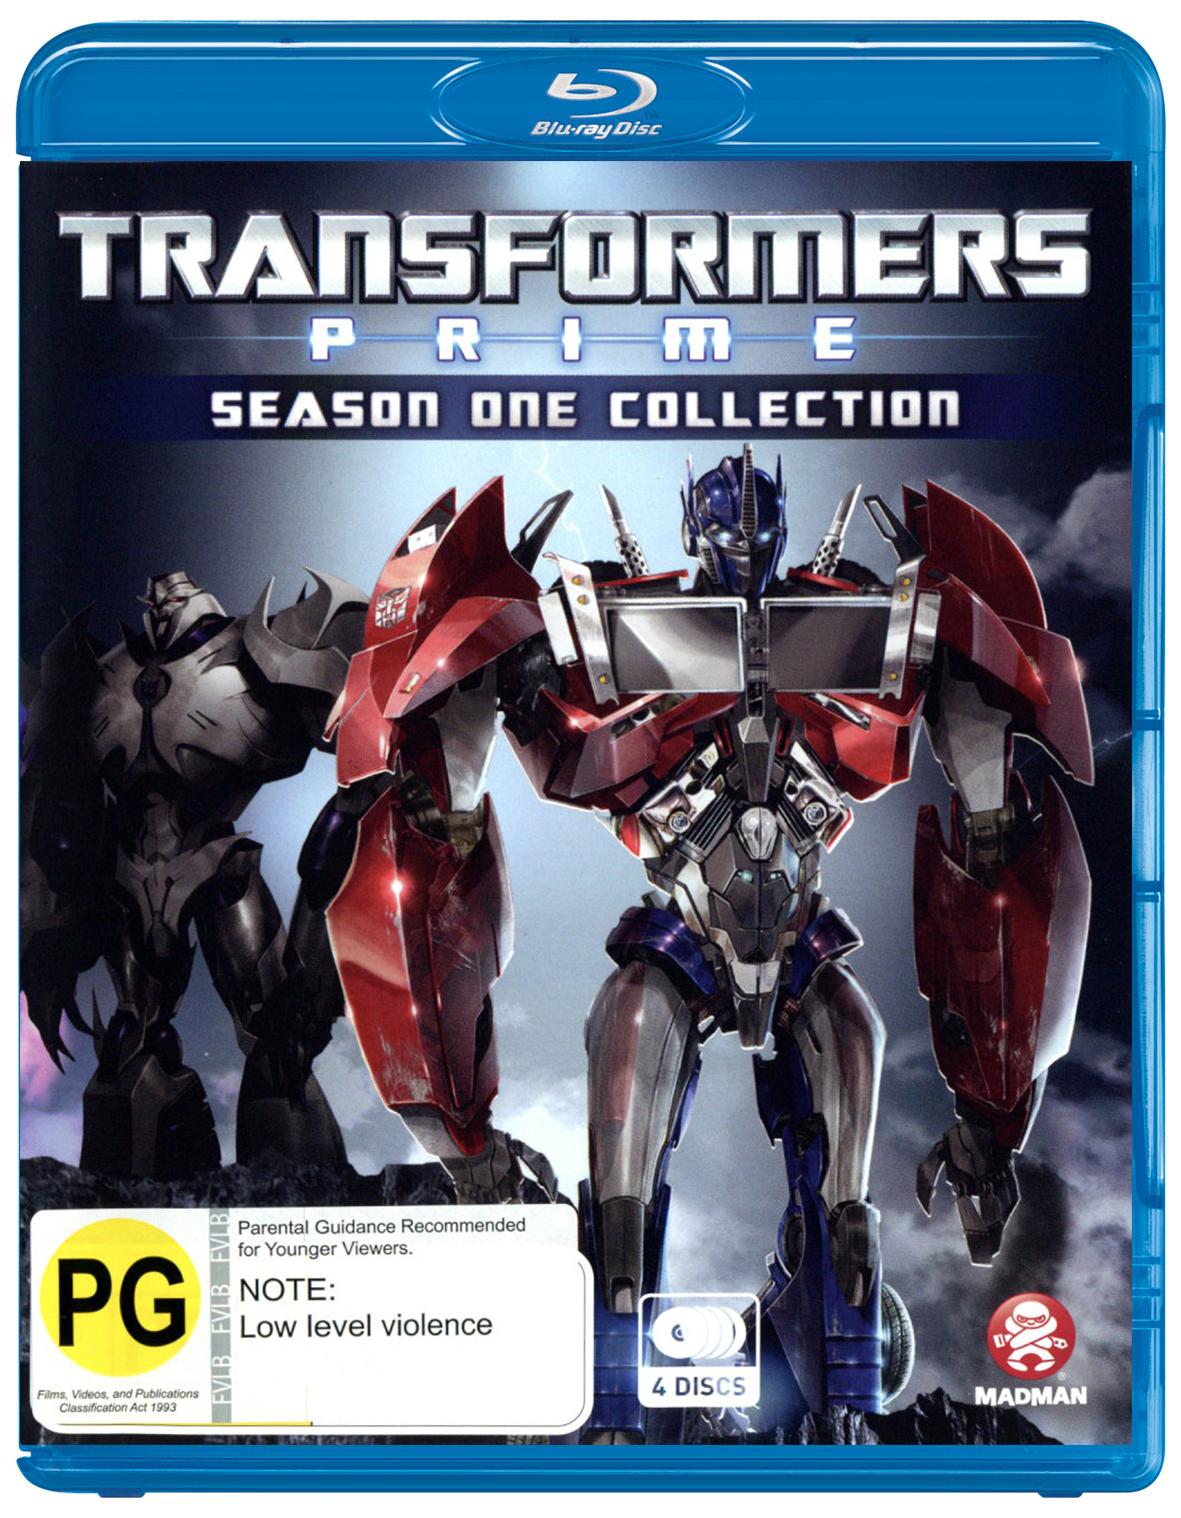 Transformers: Prime - Season 1 on Blu-ray image